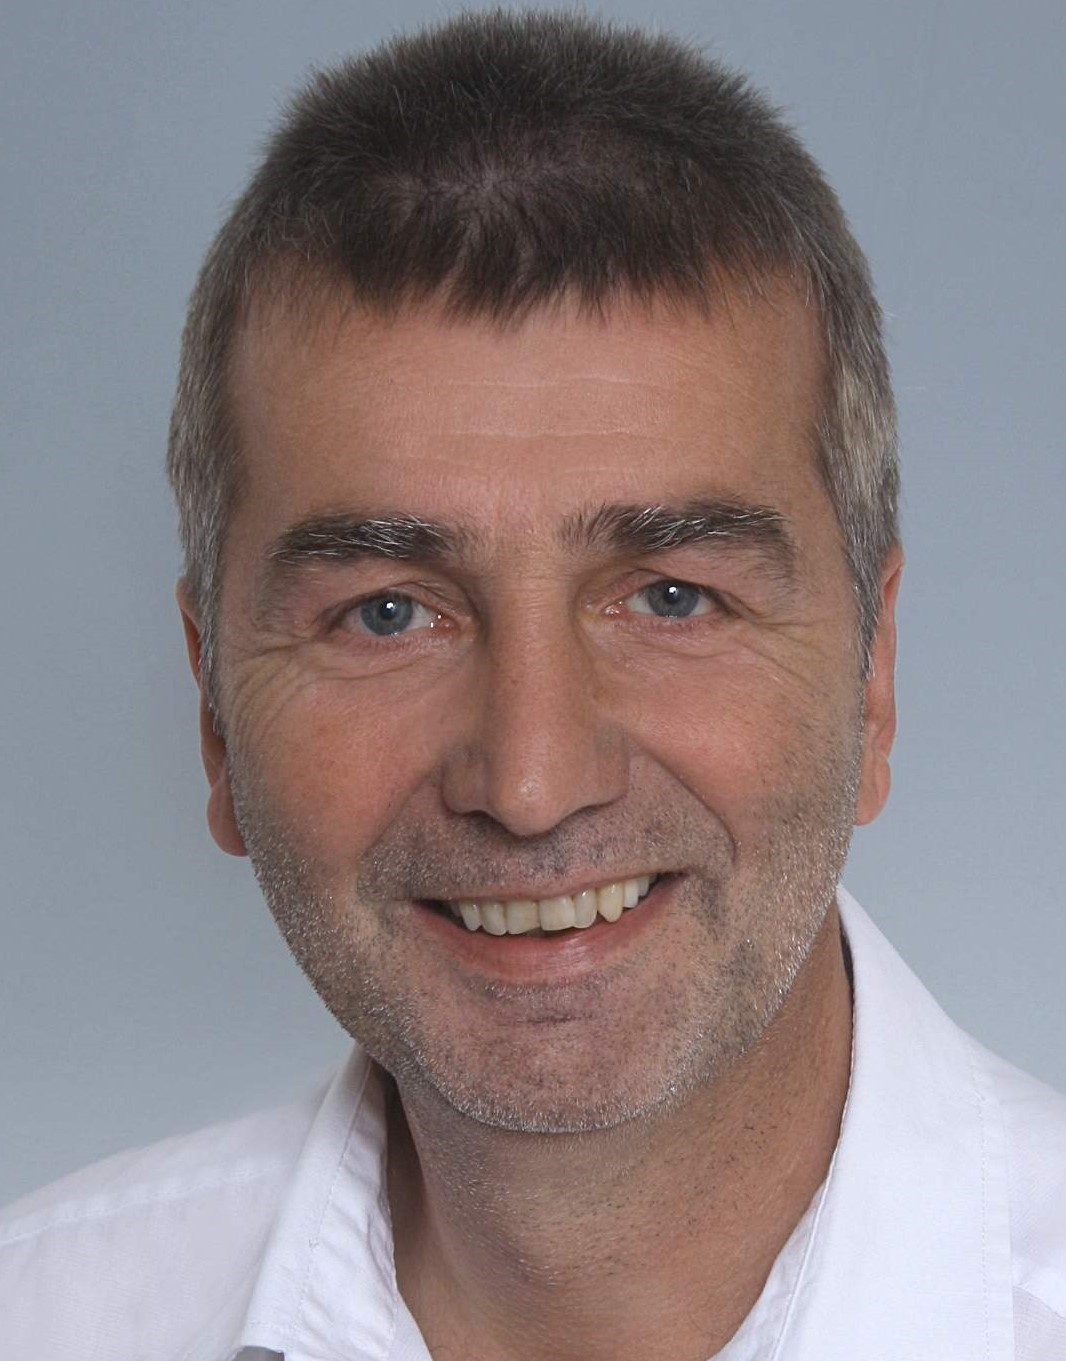 Peter Schröder Immobilienmakler Kamen, Unna und Umgebung